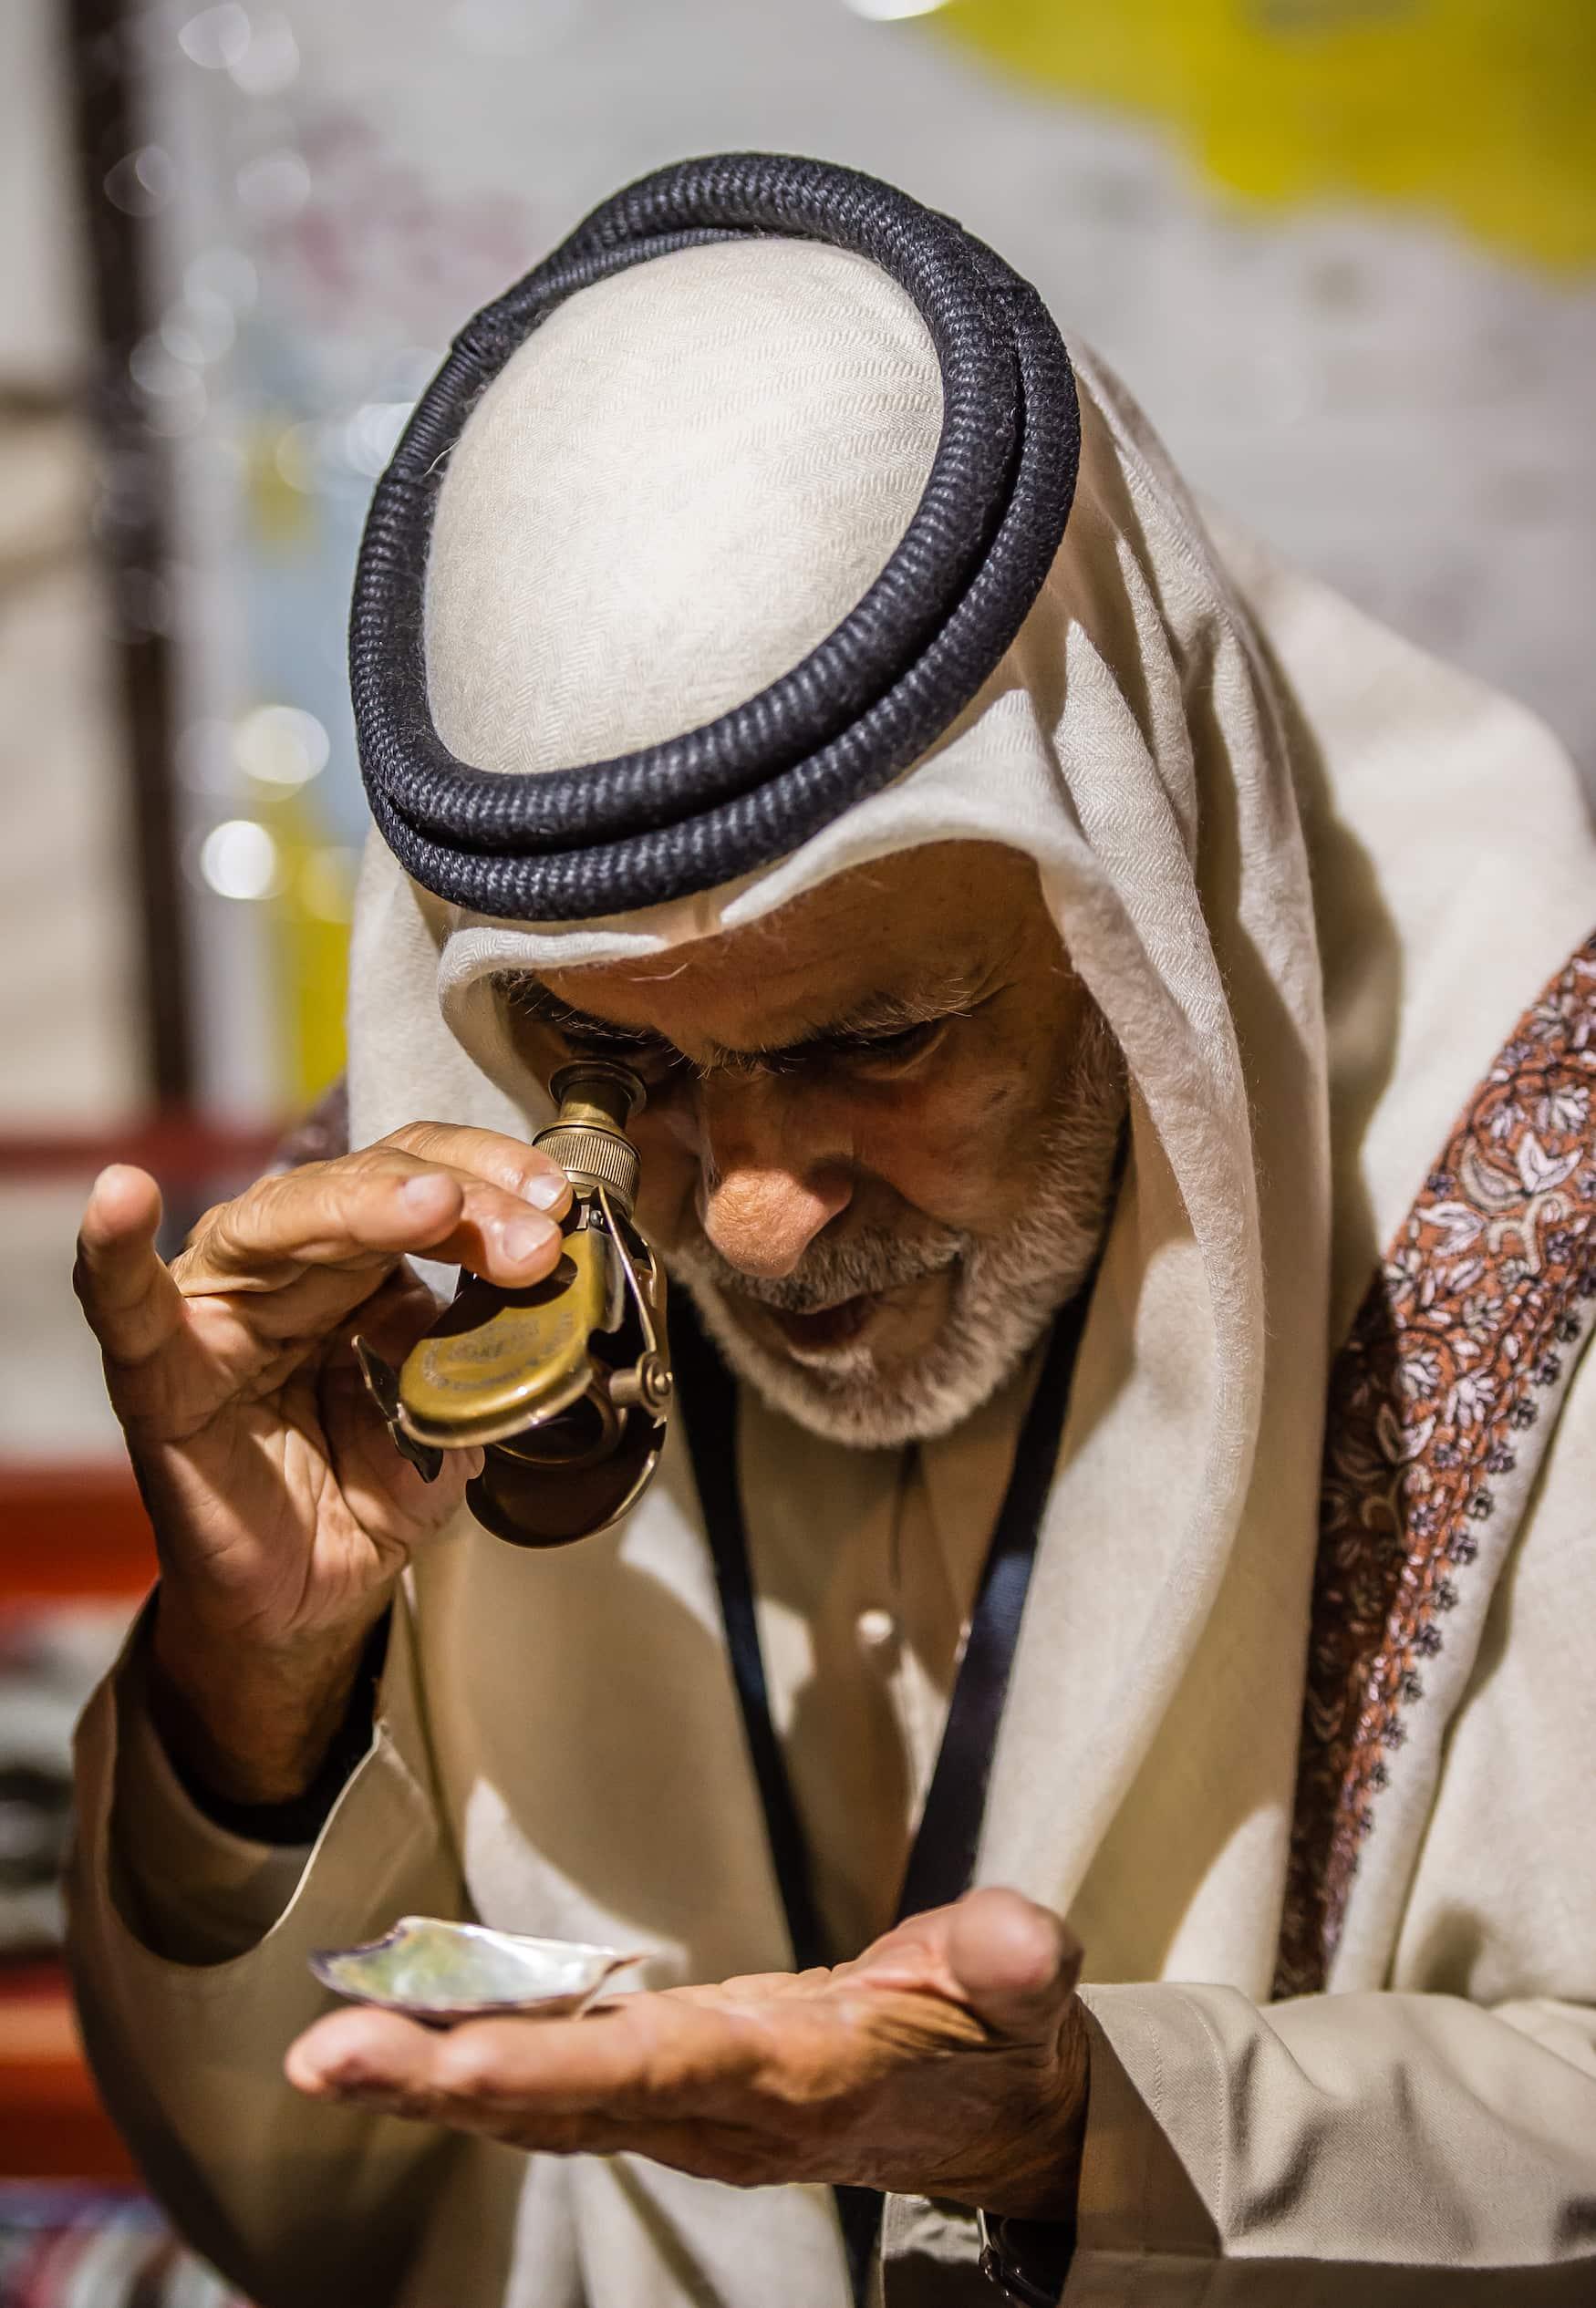 Perlenfischer begutachtet Perle in Abu Dhabi